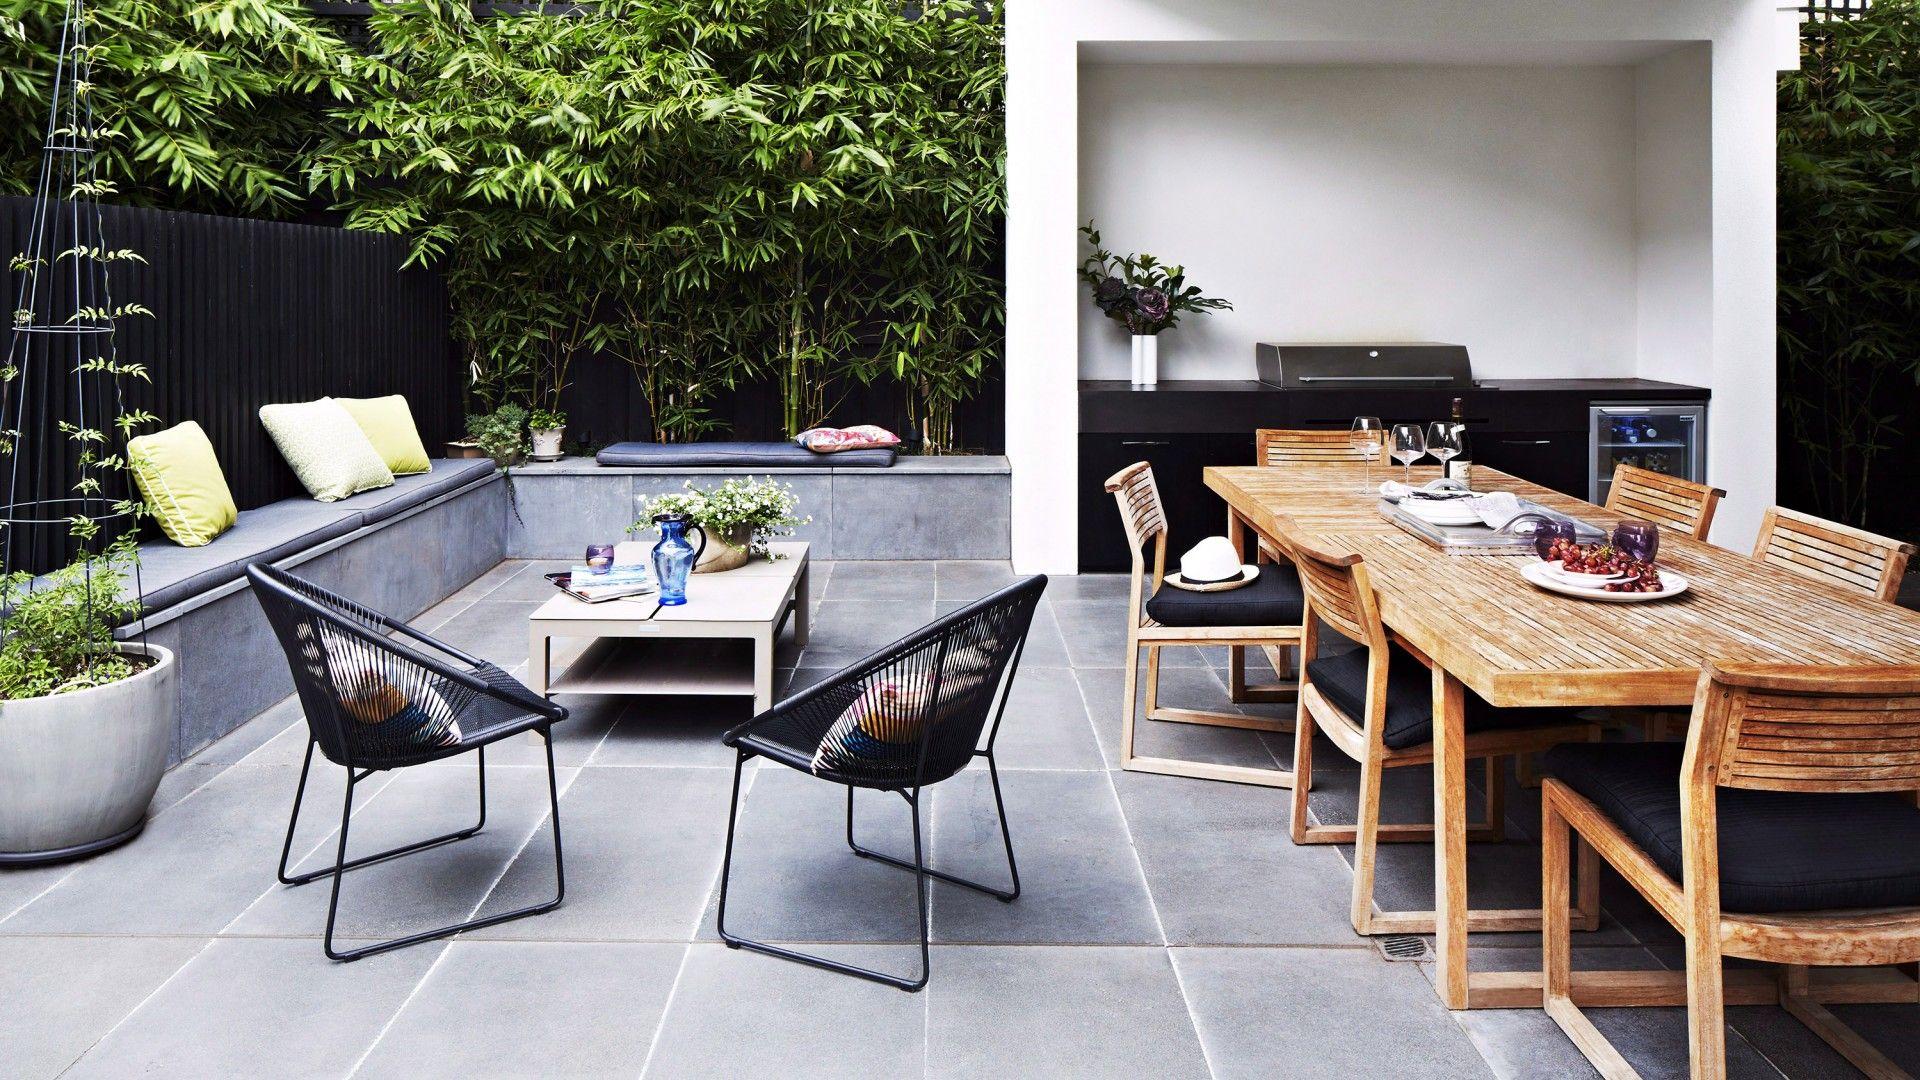 Ben Scott Garden Design Melbourne | small garden spaces | Pinterest ...